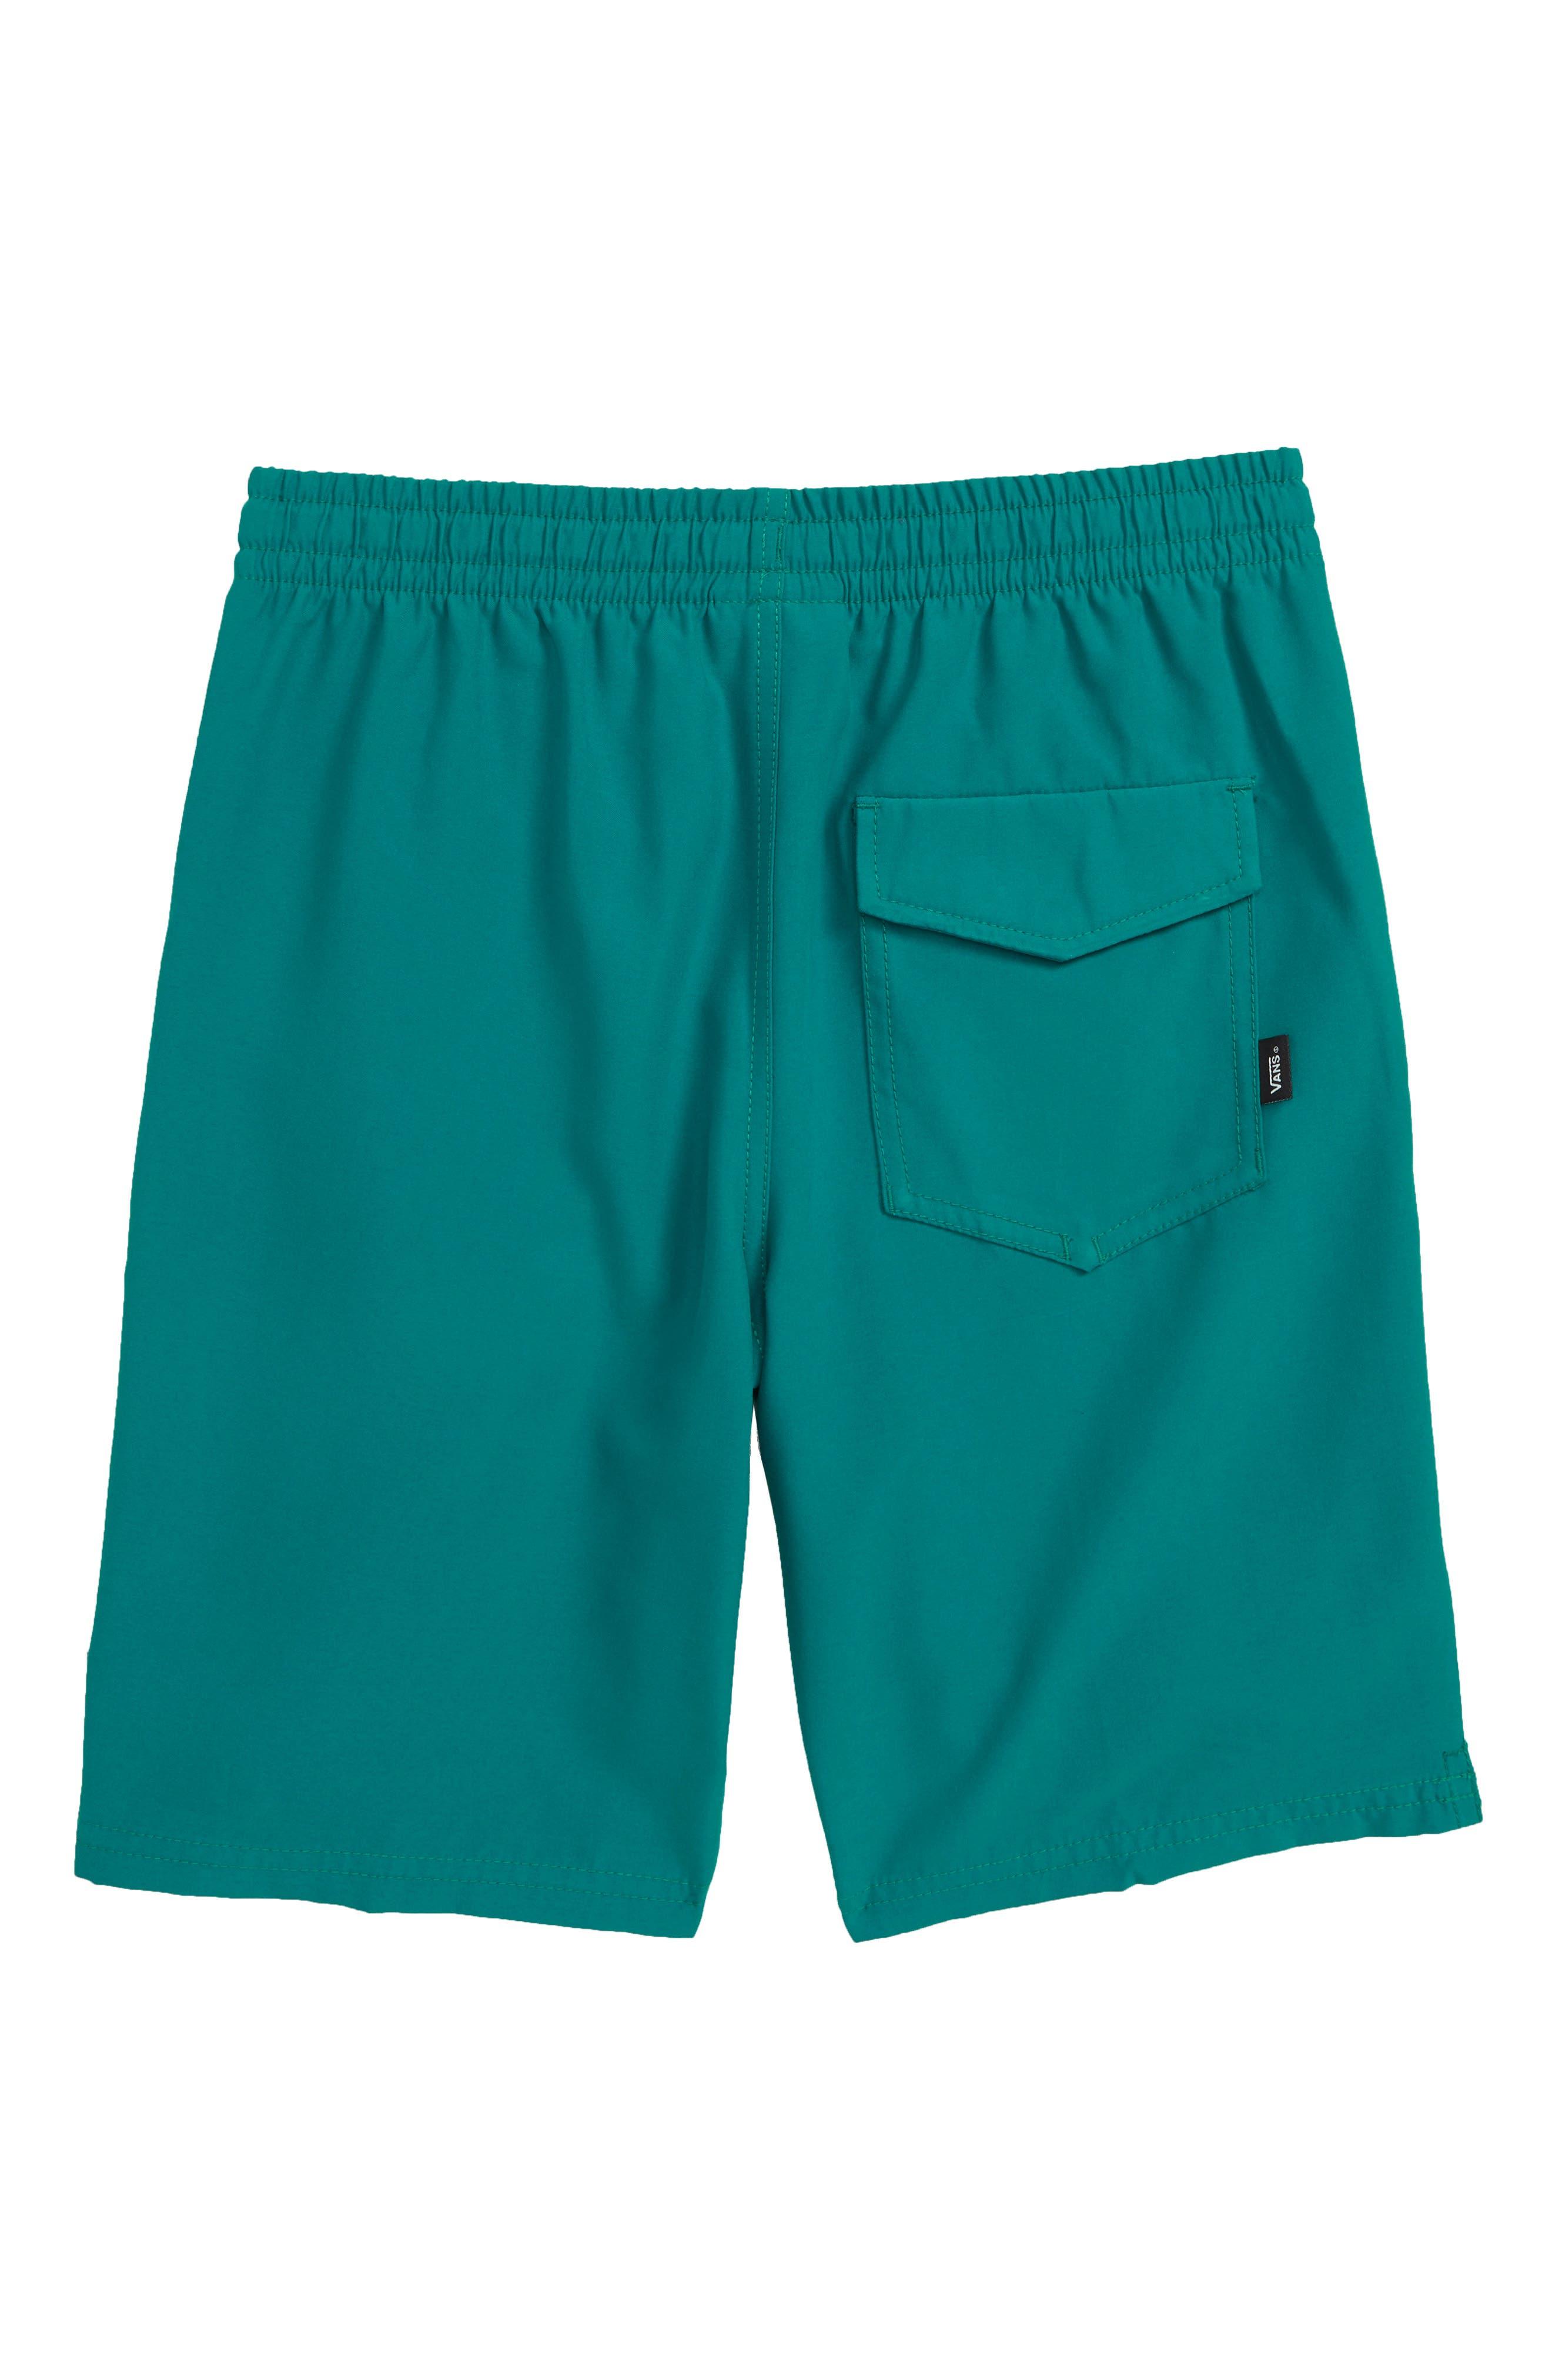 VANS,                             Primary Decksider Volley Shorts,                             Alternate thumbnail 2, color,                             QUETZAL